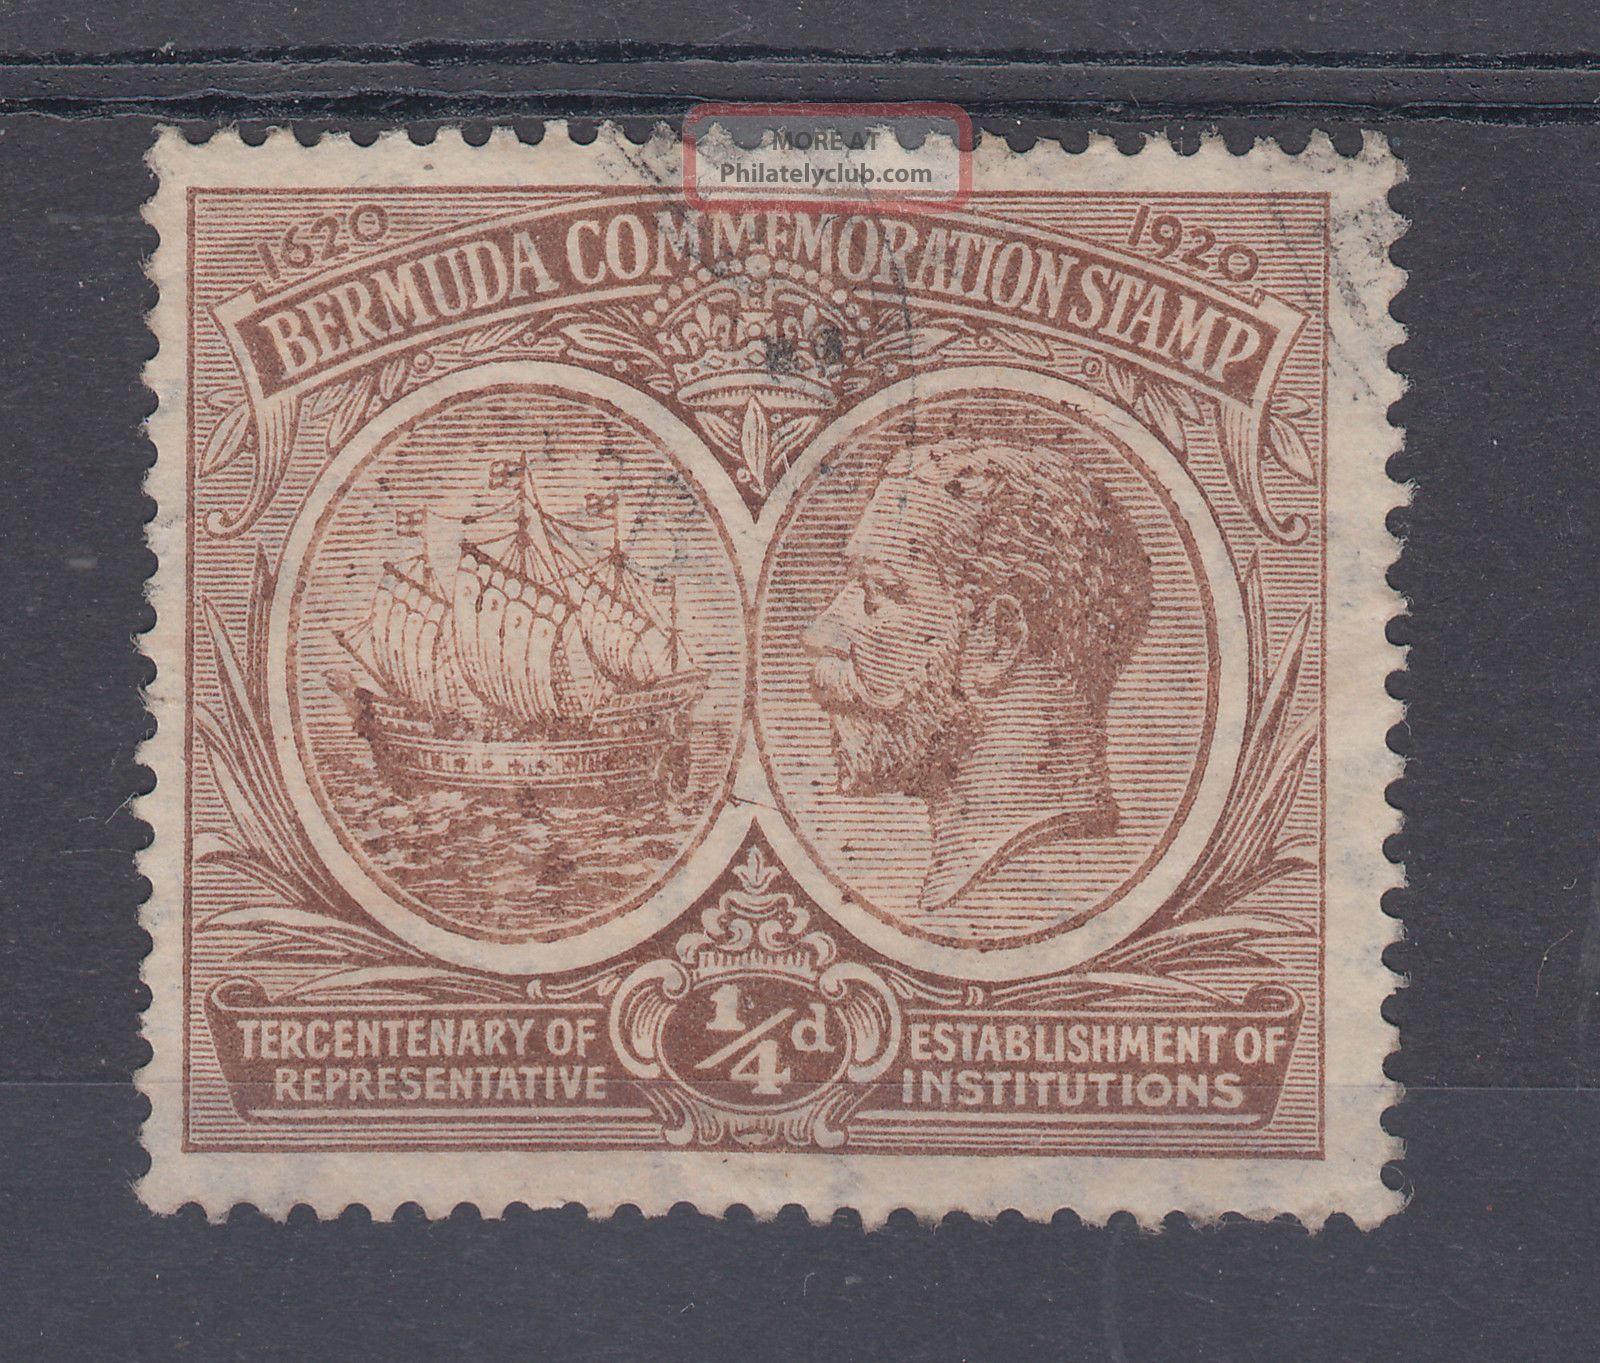 1920 Bermuda 0.  25d Tercentenary Stamp (sg 59) British Colonies & Territories photo